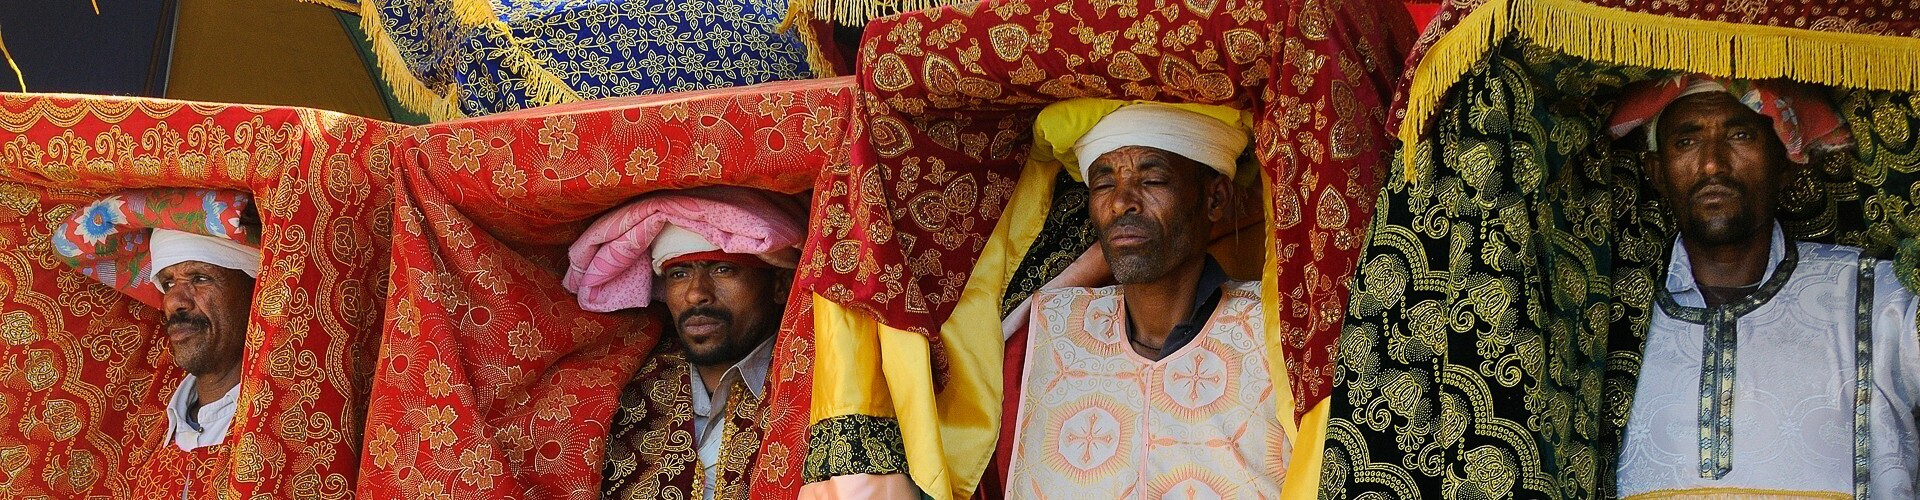 voyage photo peuples et traditions christophe boisvieux header